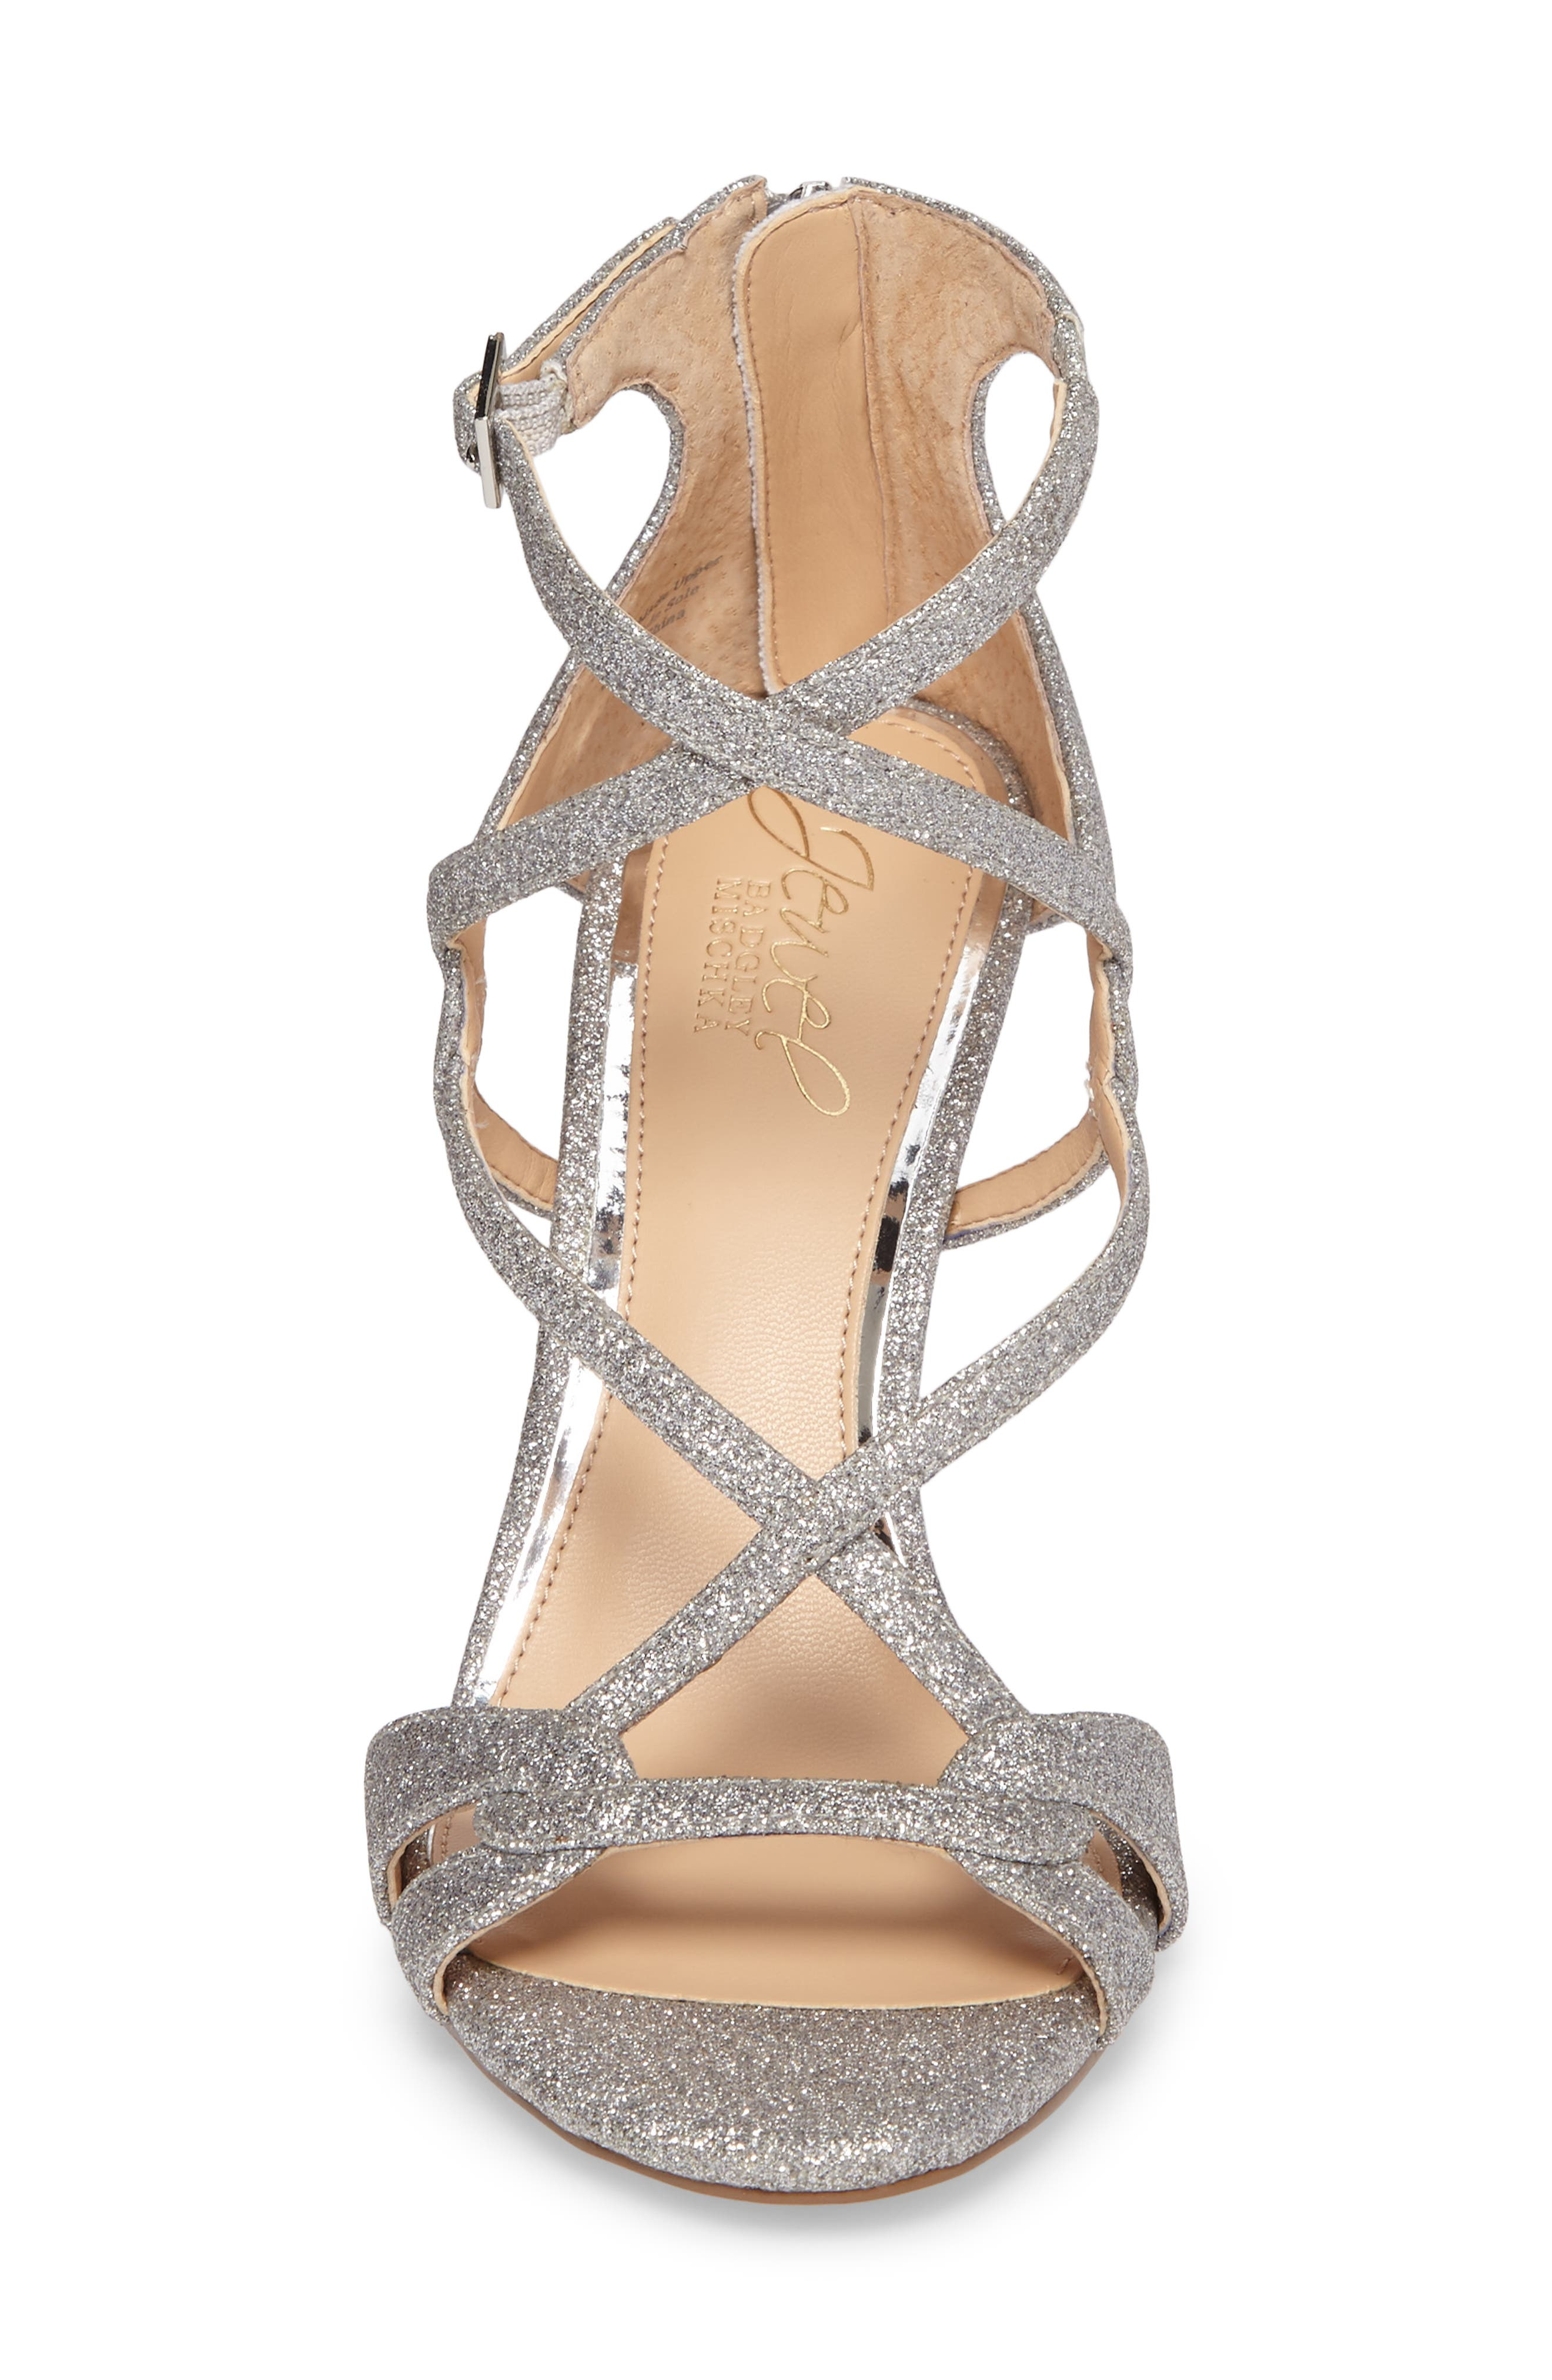 Aliza Strappy Glitter Sandal,                             Alternate thumbnail 4, color,                             043